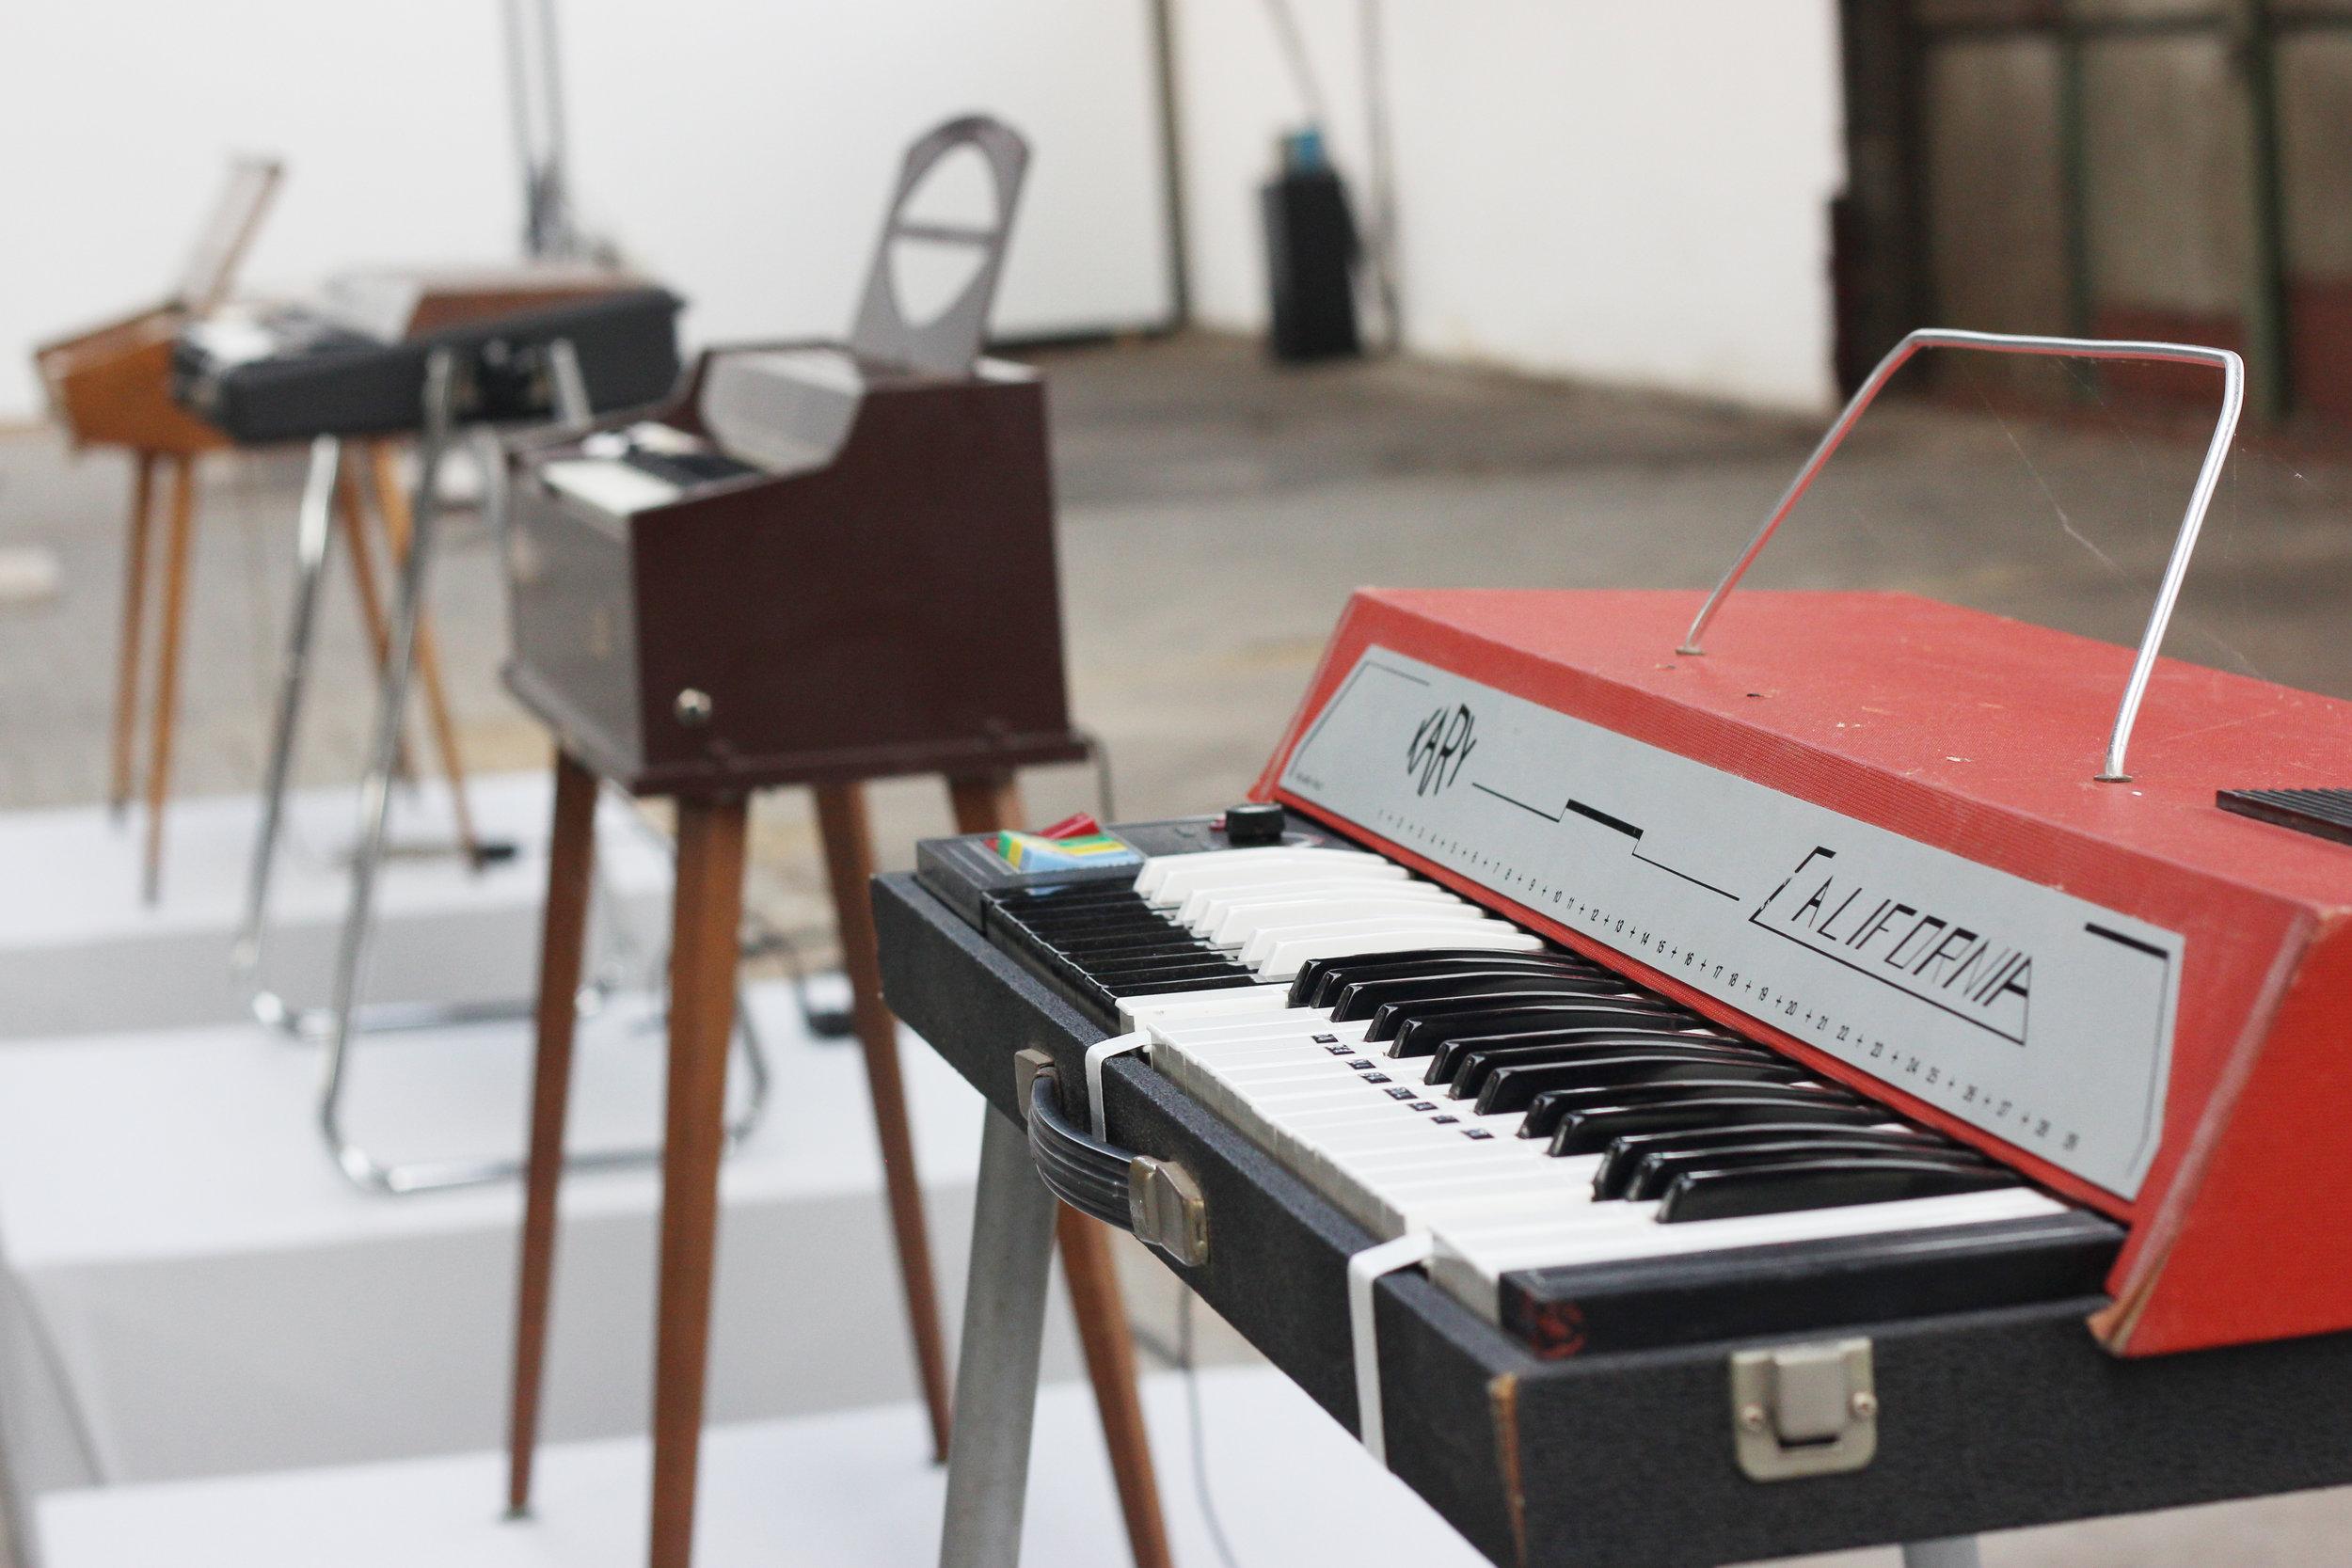 organa dordtyart, Elise 't Hart en Nils Davidse 5.jpg